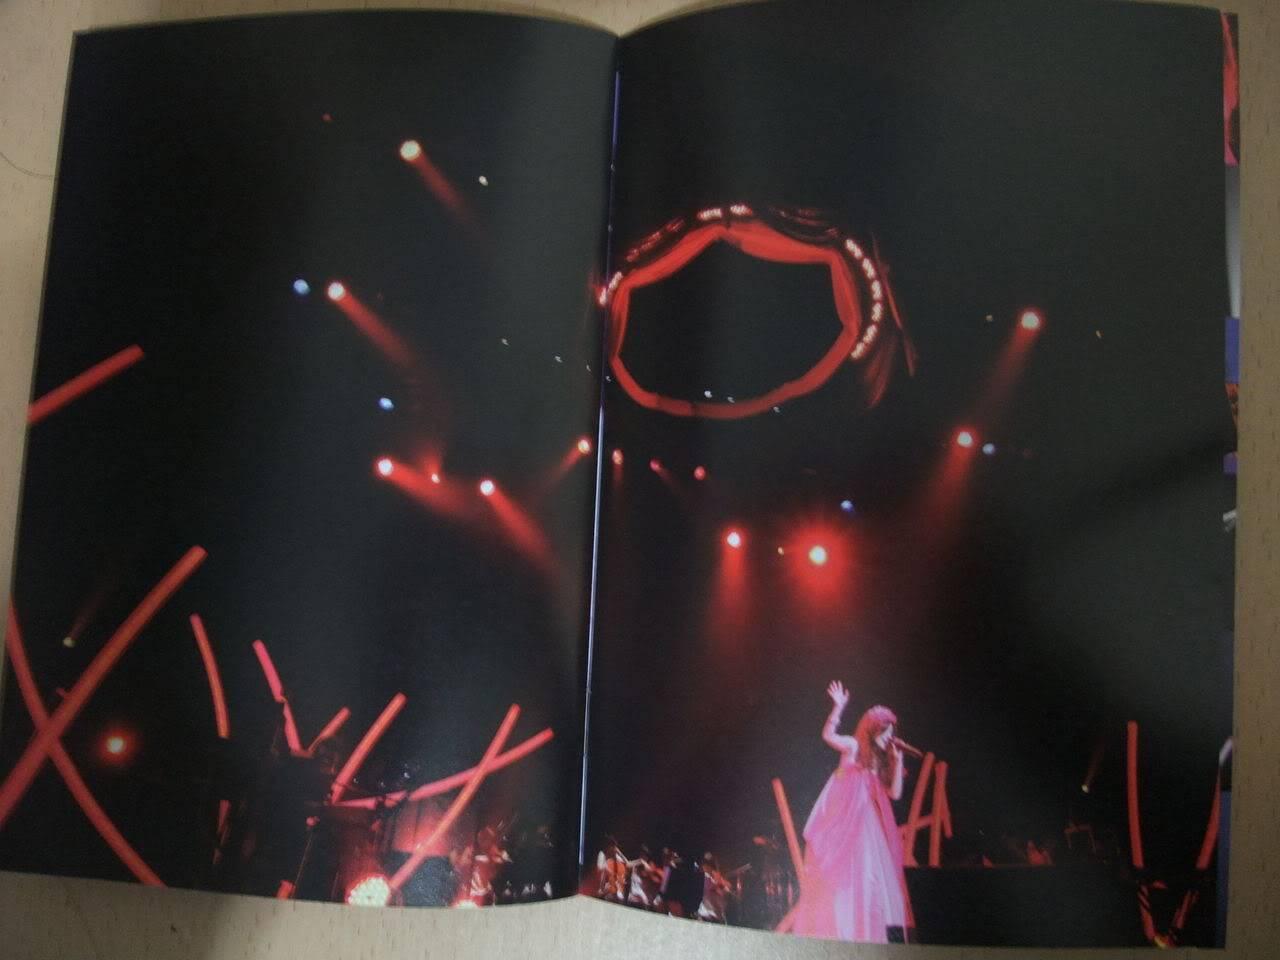 alan 1st concert - voice of you - Page 3 66045d7c5fba023e29388ac6